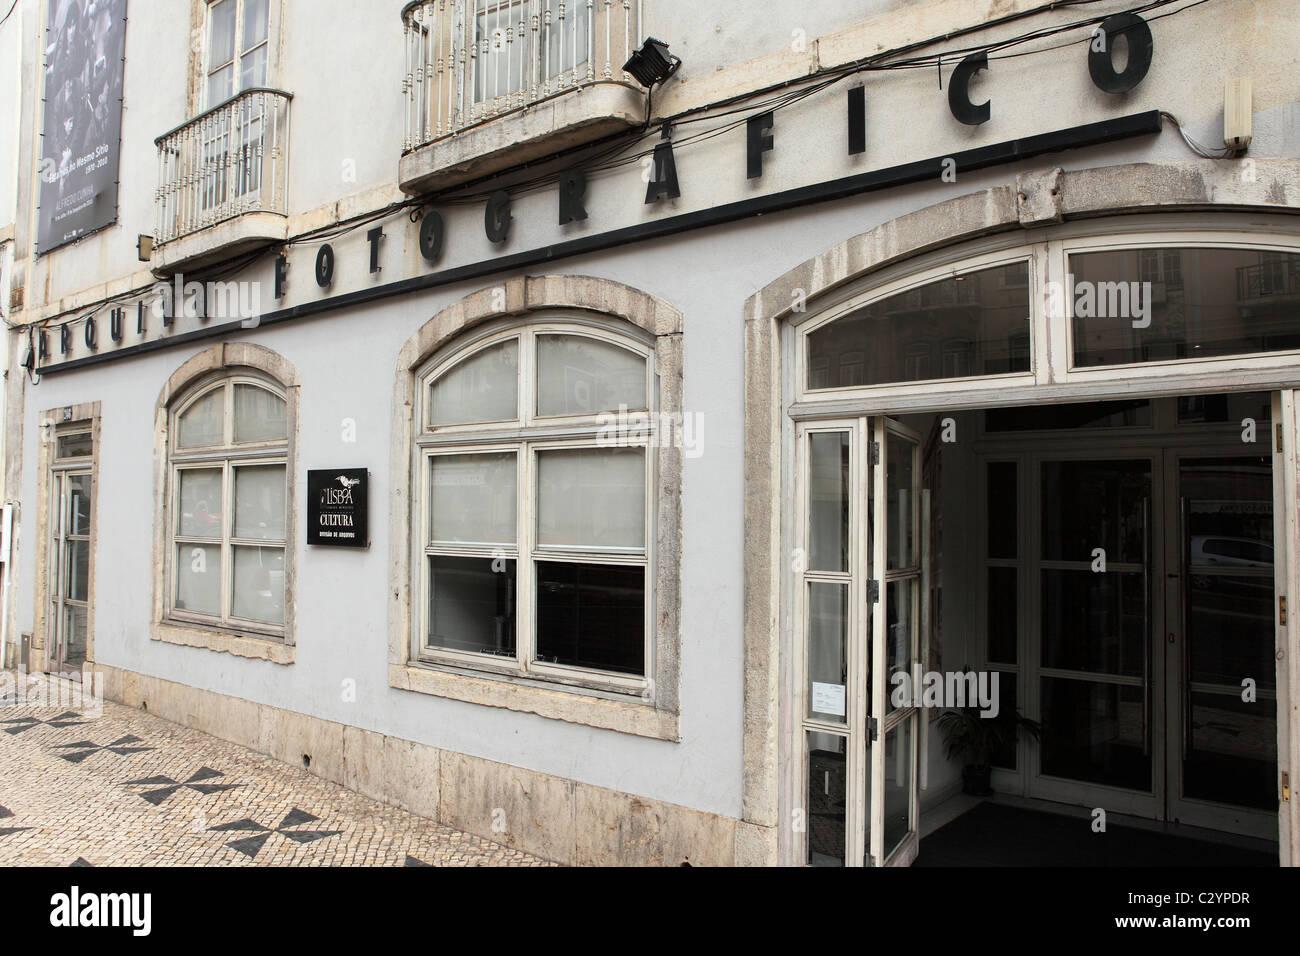 The Photographic Archive (Arqivo Fotografico) in Lisbon, Portugal. - Stock Image